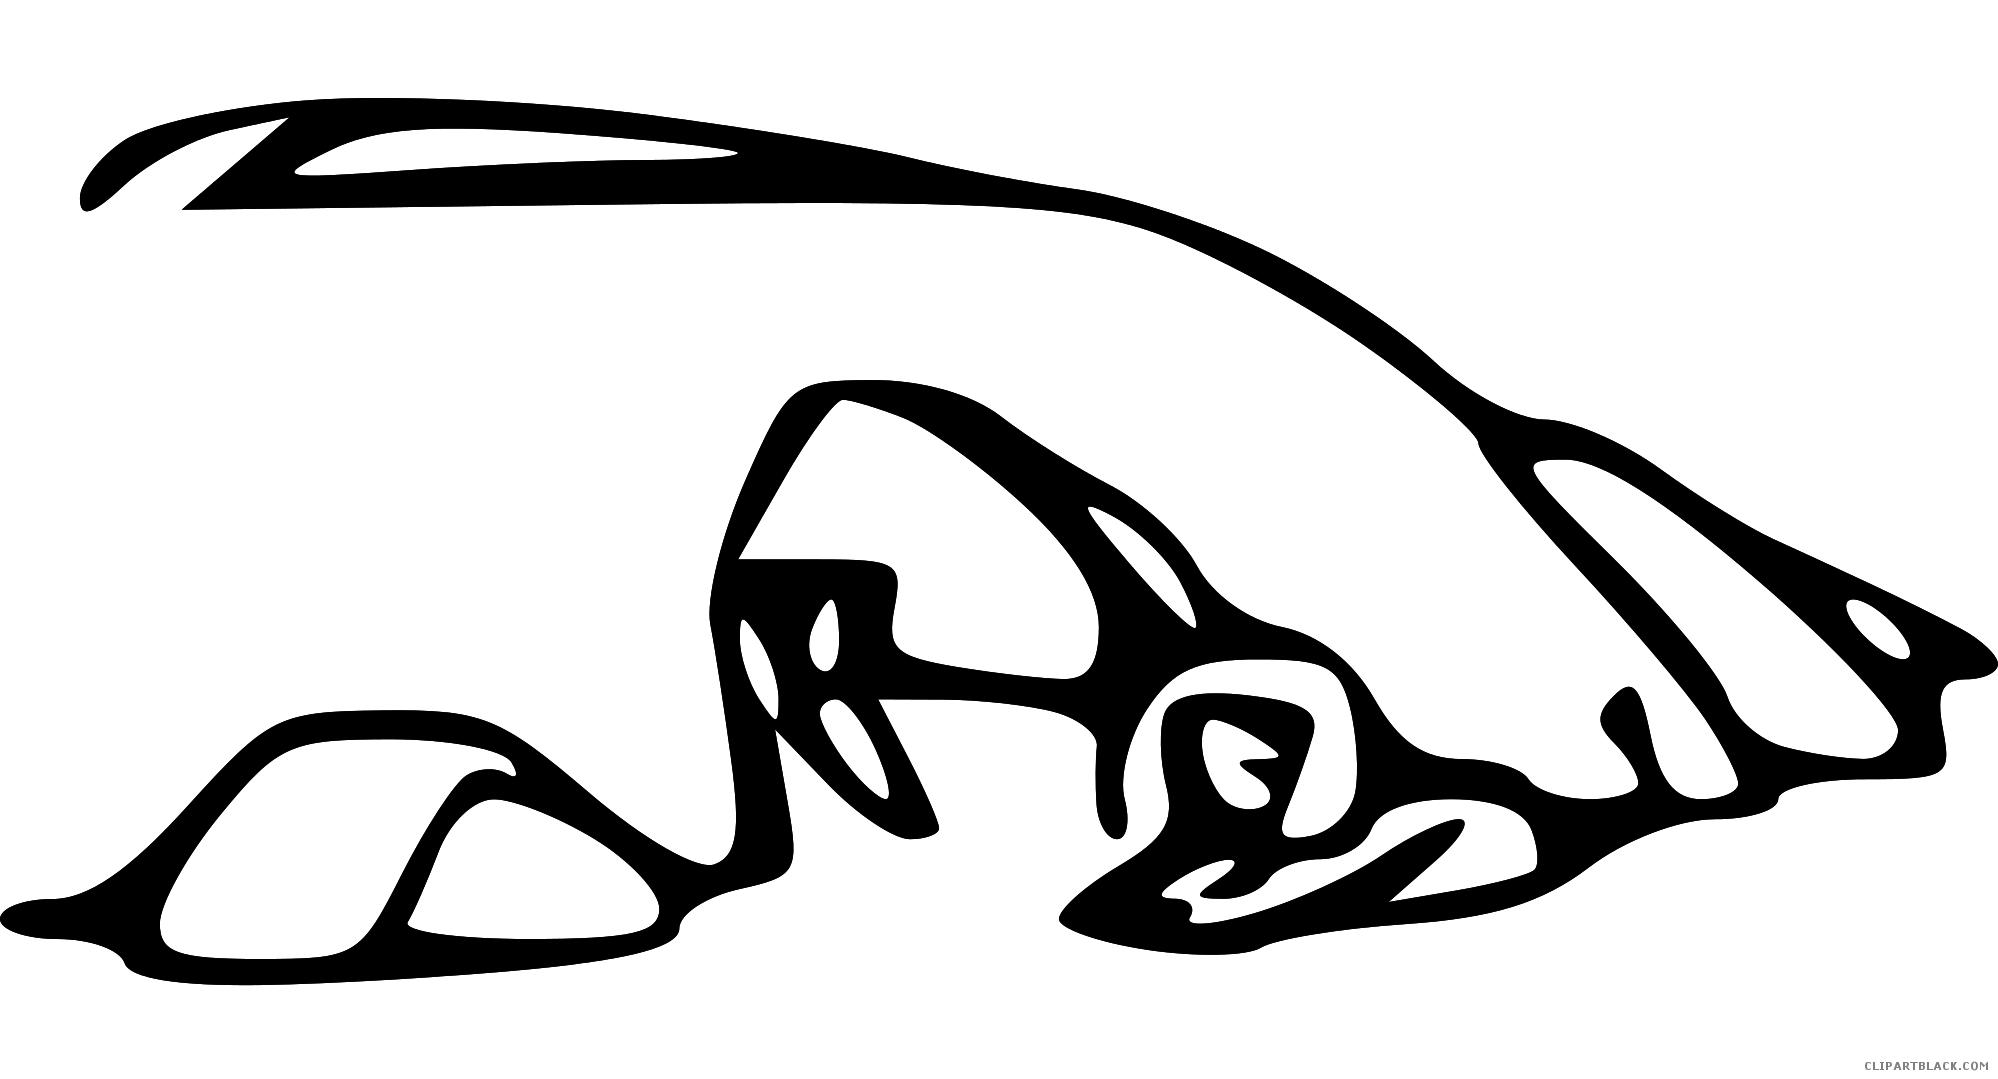 Bear clipartblack com animal. Cave clipart black and white